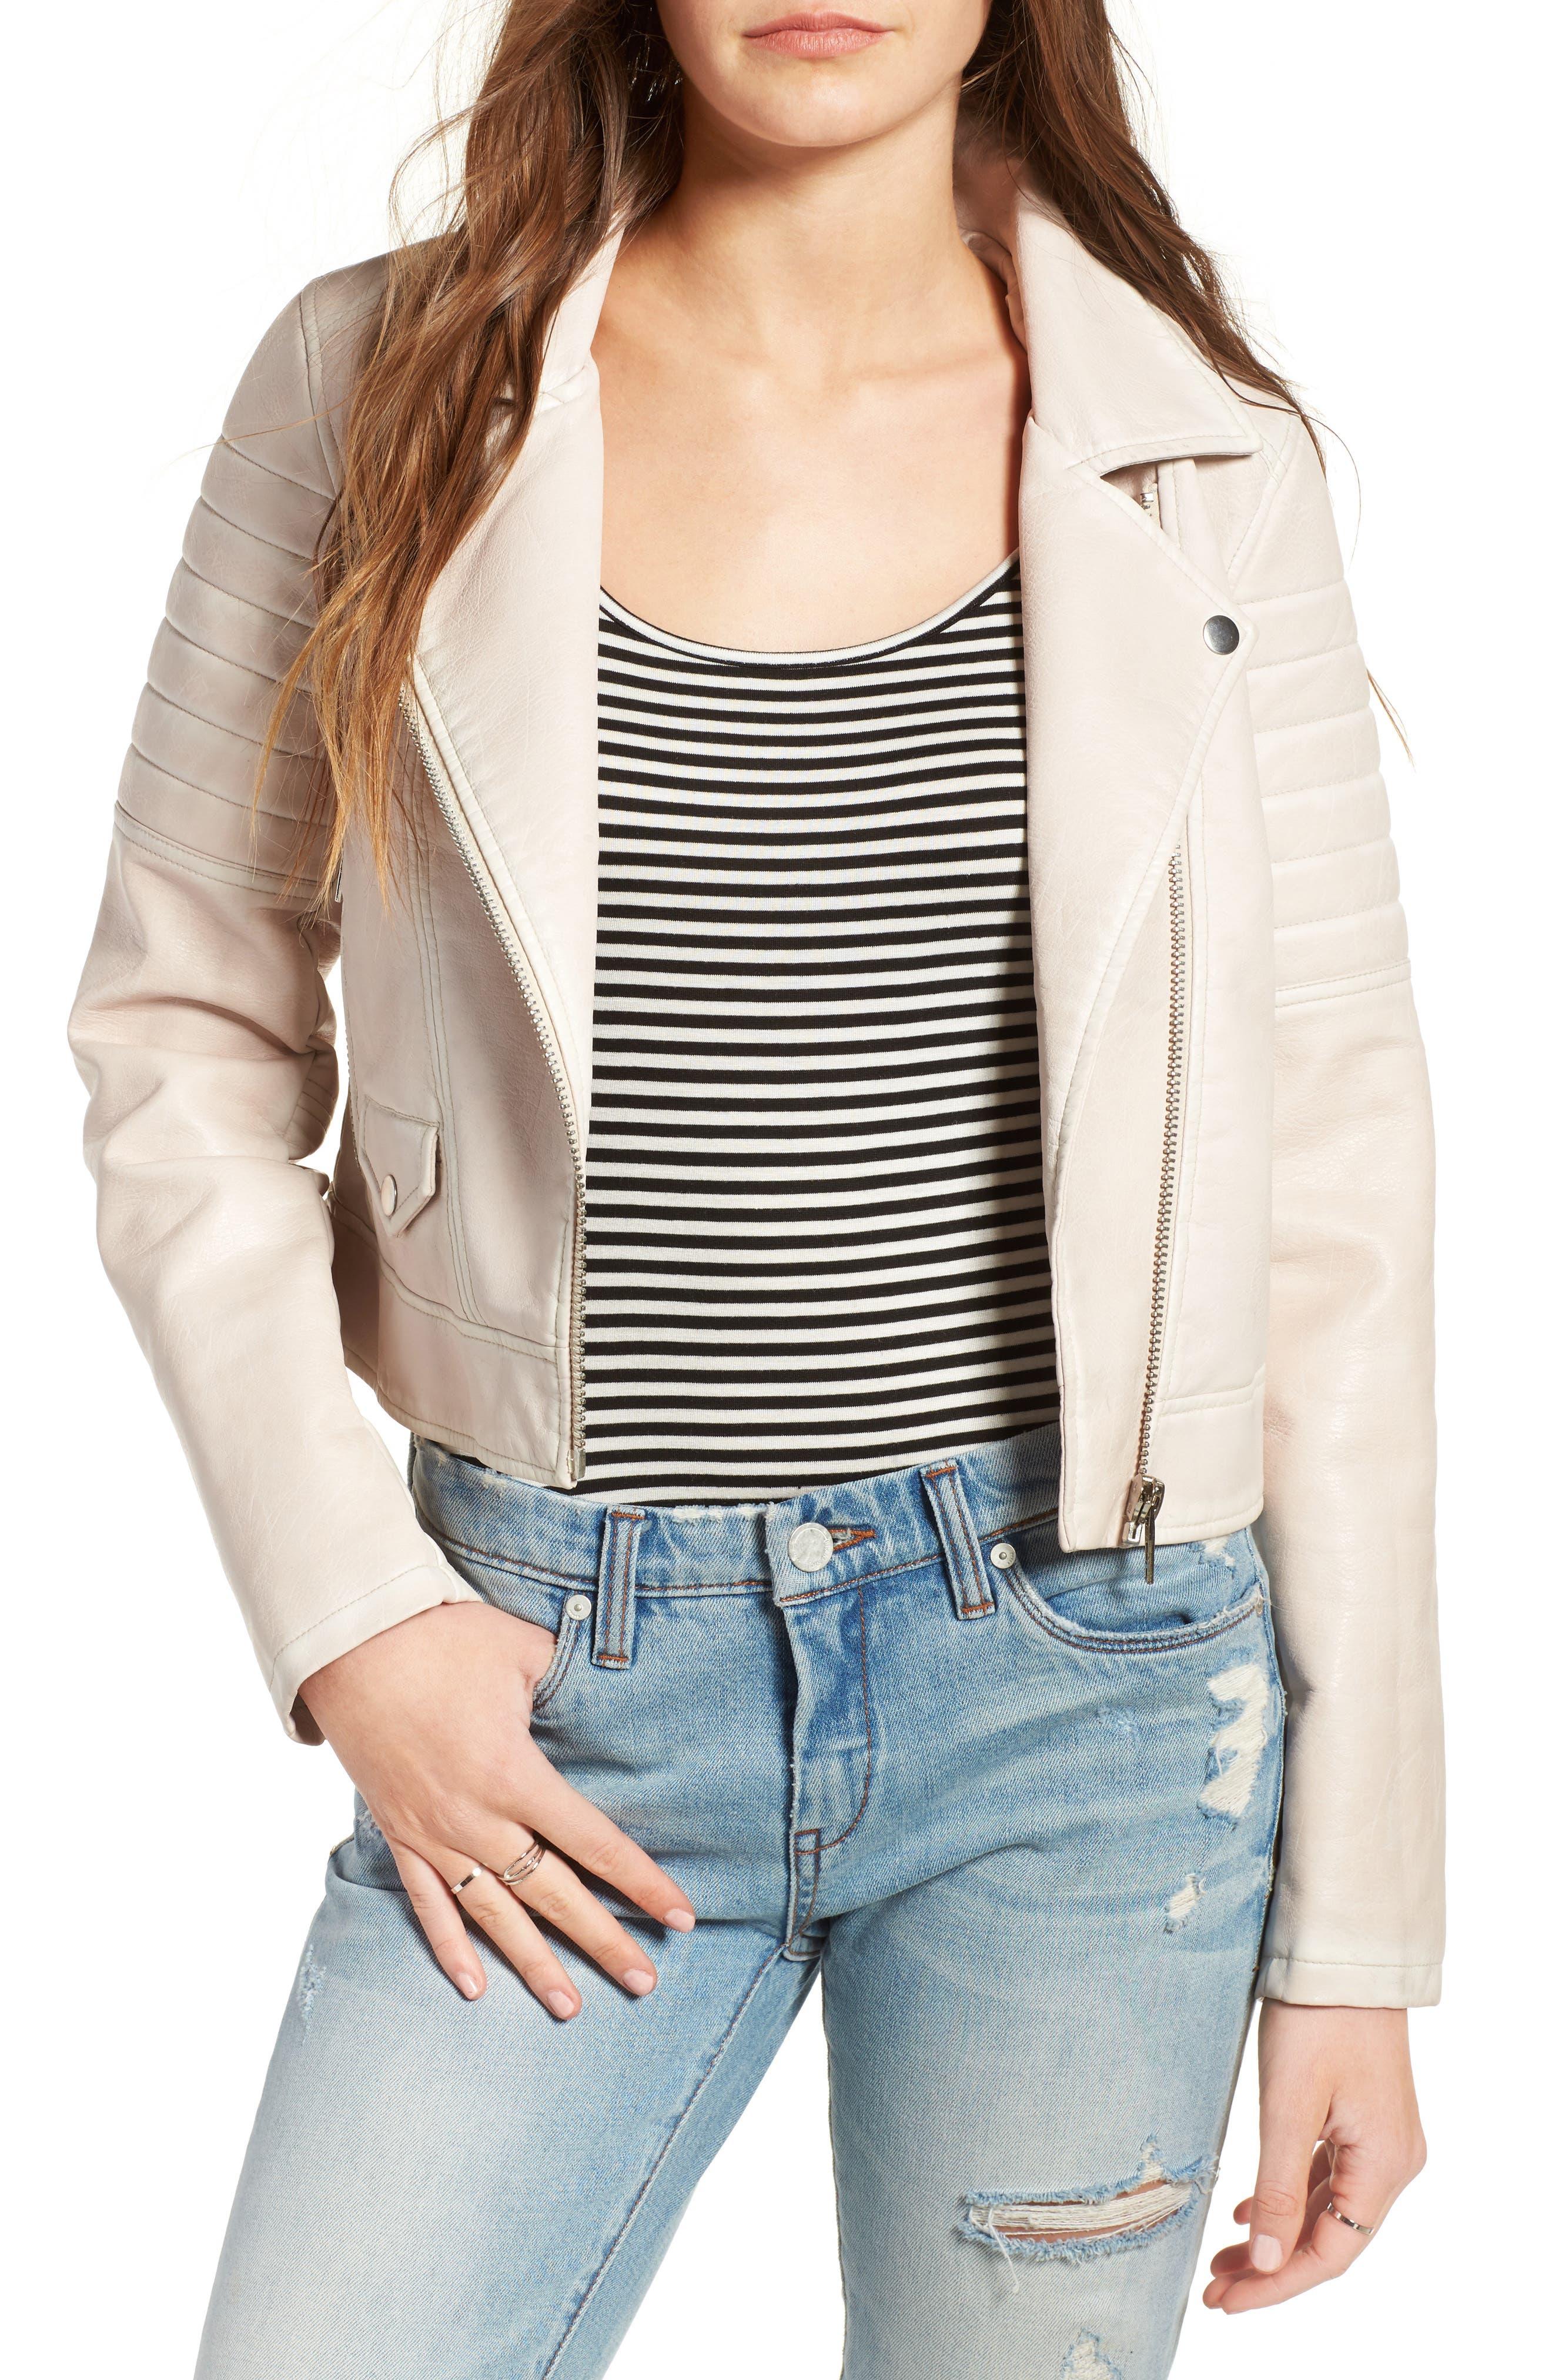 Alternate Image 1 Selected - BLANKNYC Faux Leather Moto Jacket